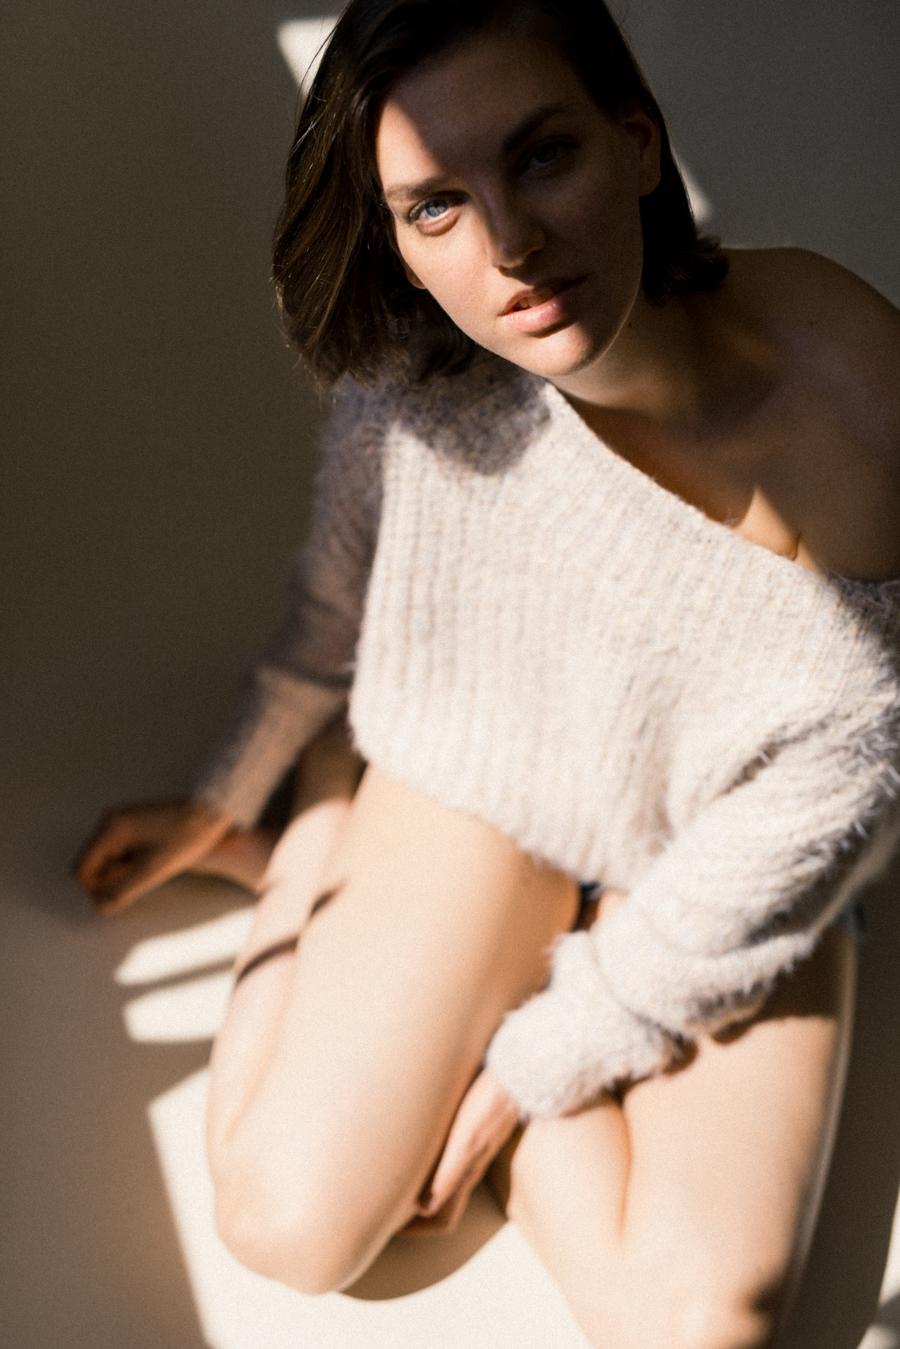 Elisabeth Ehrnroot, Nord & Mae, Susanna Nordvall, Portrait Photography, Muotokuvaus, Henkilökuvaus (20).jpg